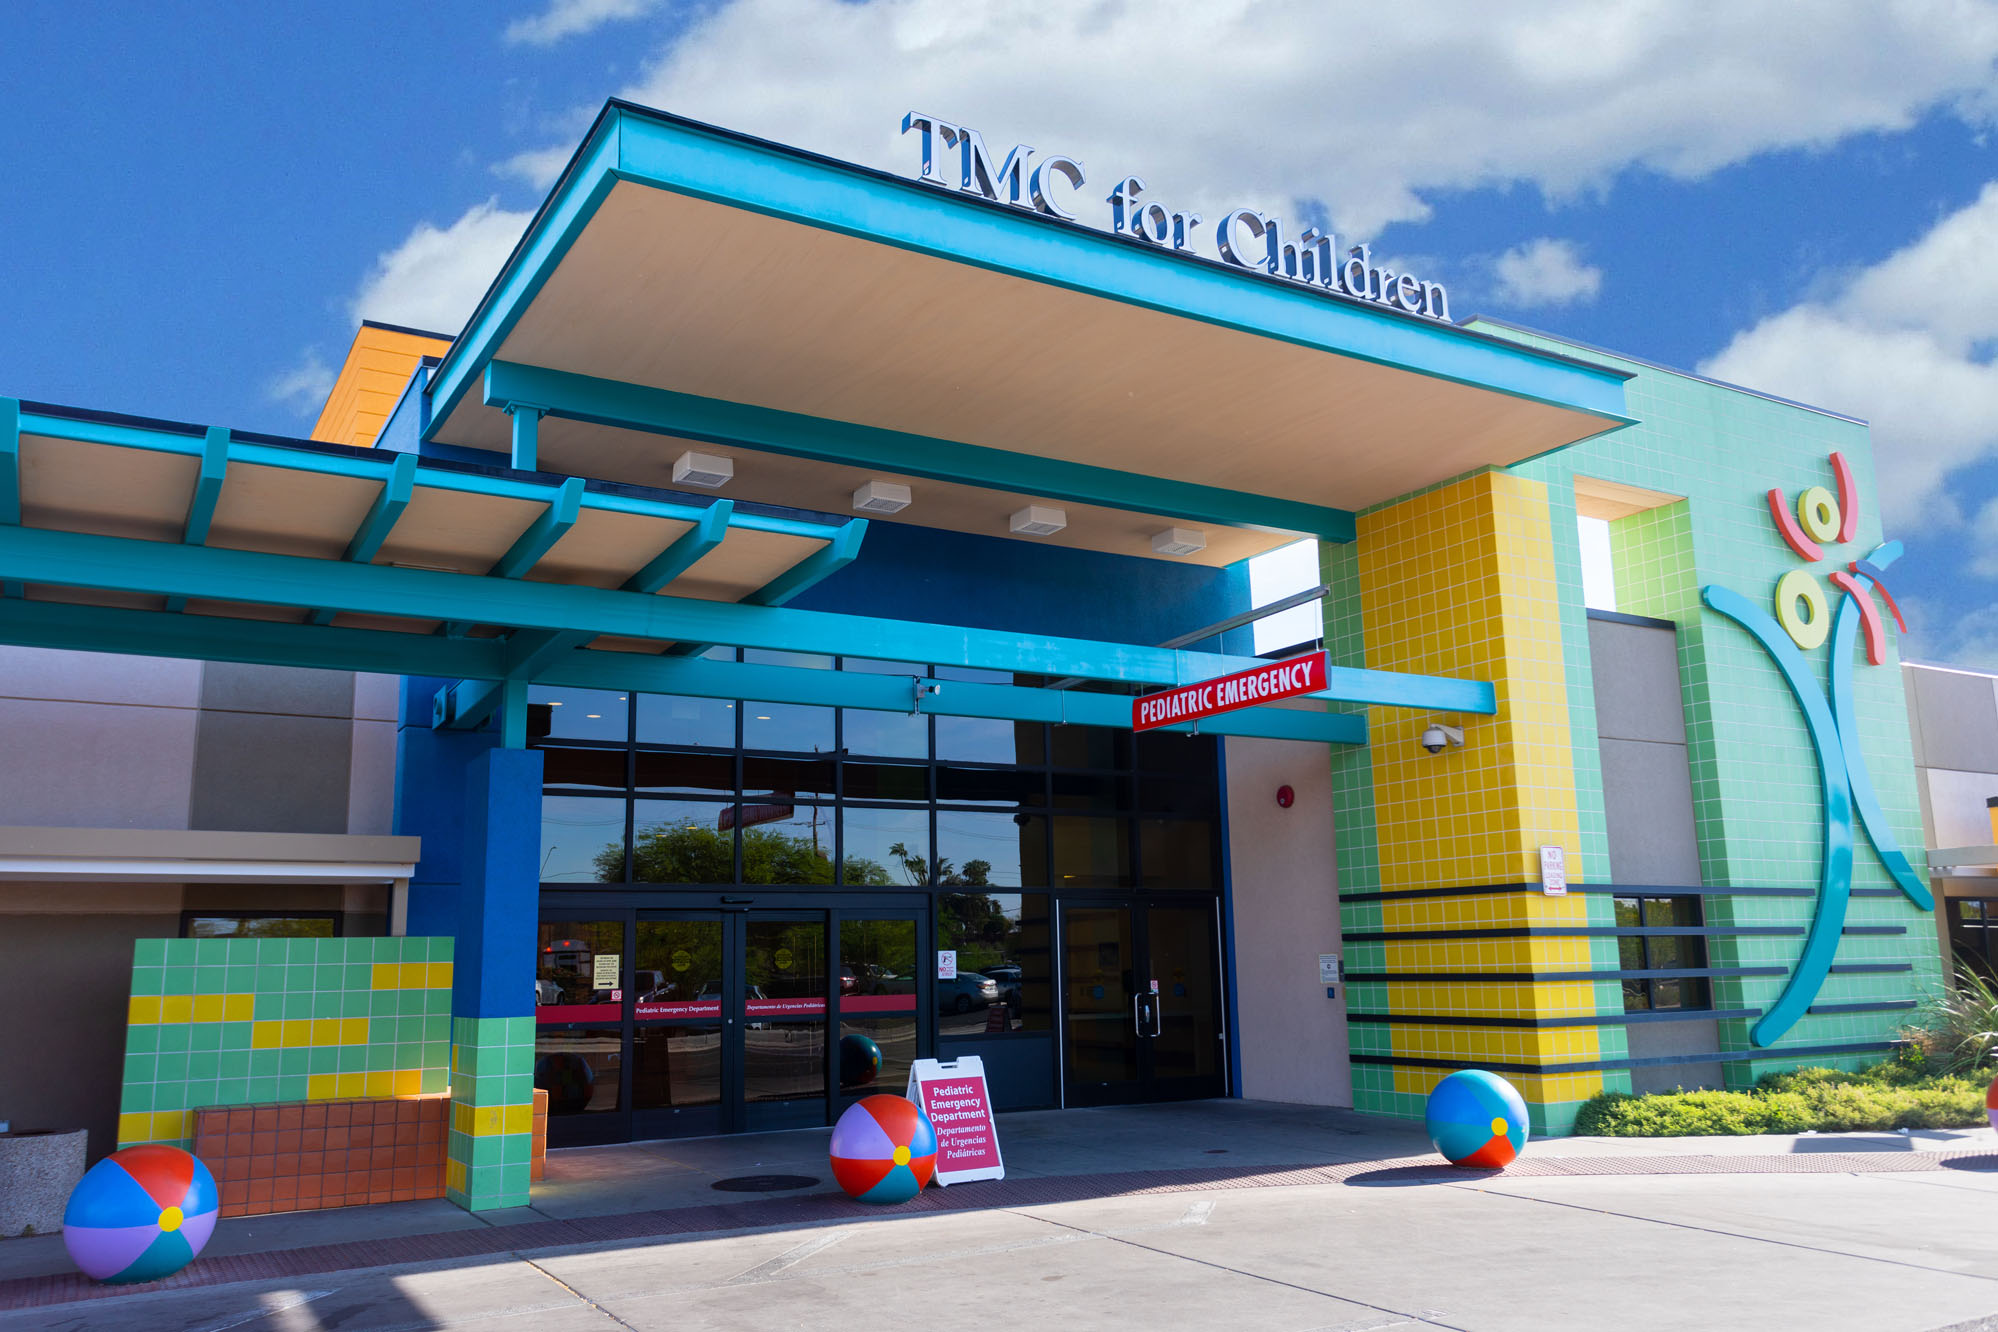 Pediatric Emergency Tucson, Arizona (AZ), Tucson Medical Center